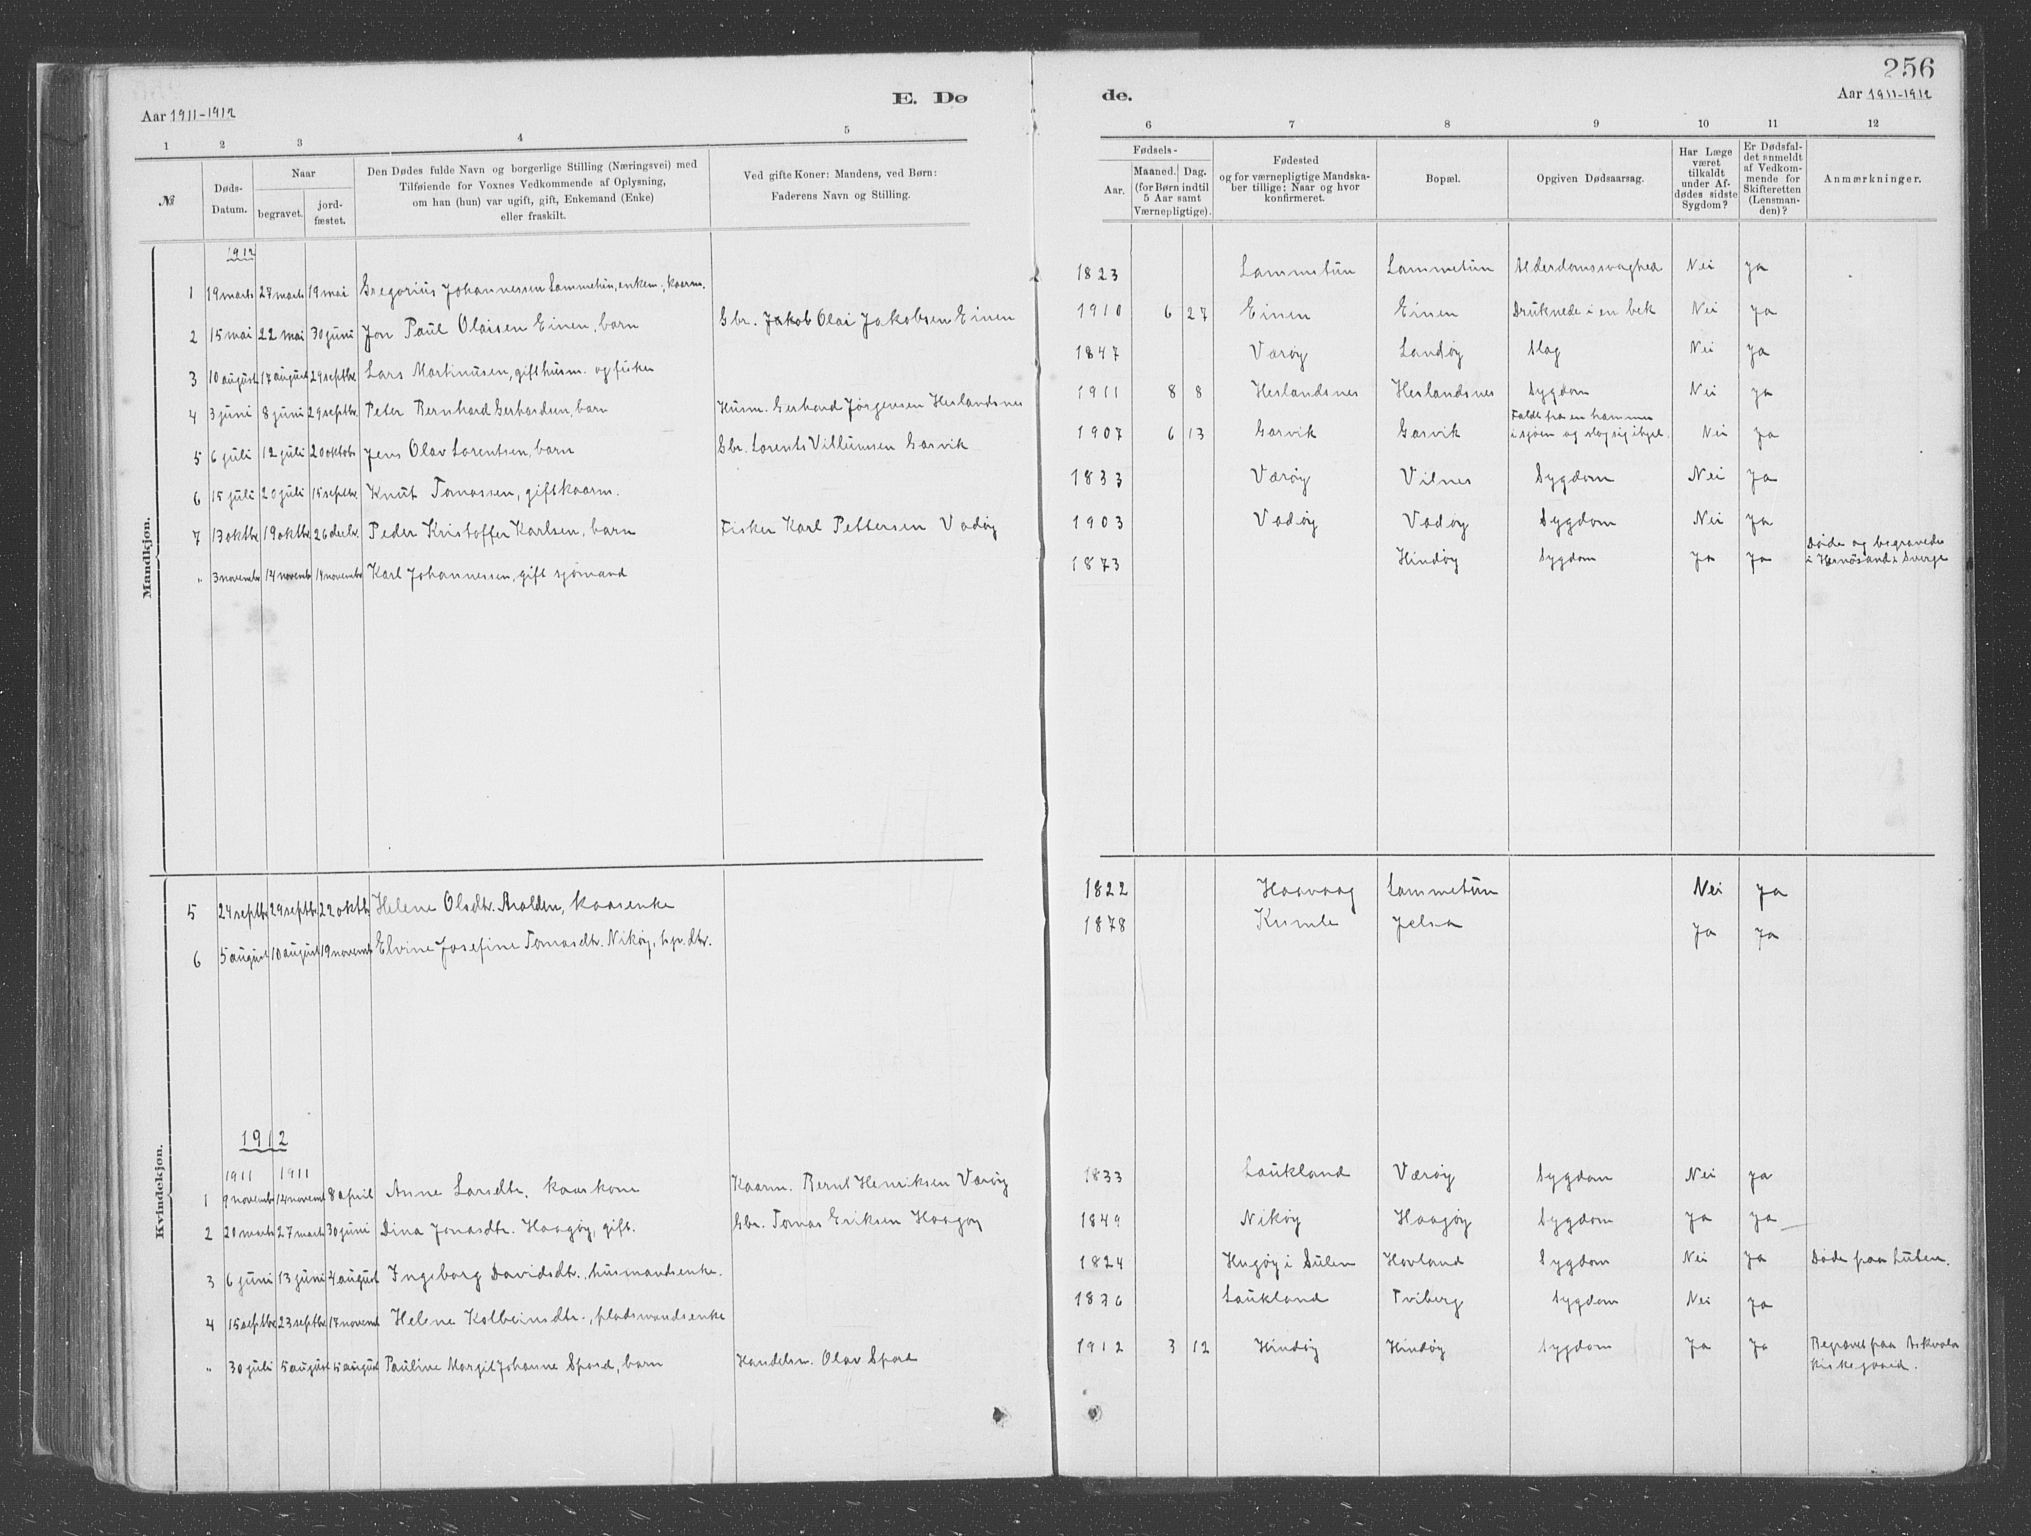 SAB, Askvoll sokneprestembete, H/Haa/Haac/L0001: Ministerialbok nr. C  1, 1879-1922, s. 256